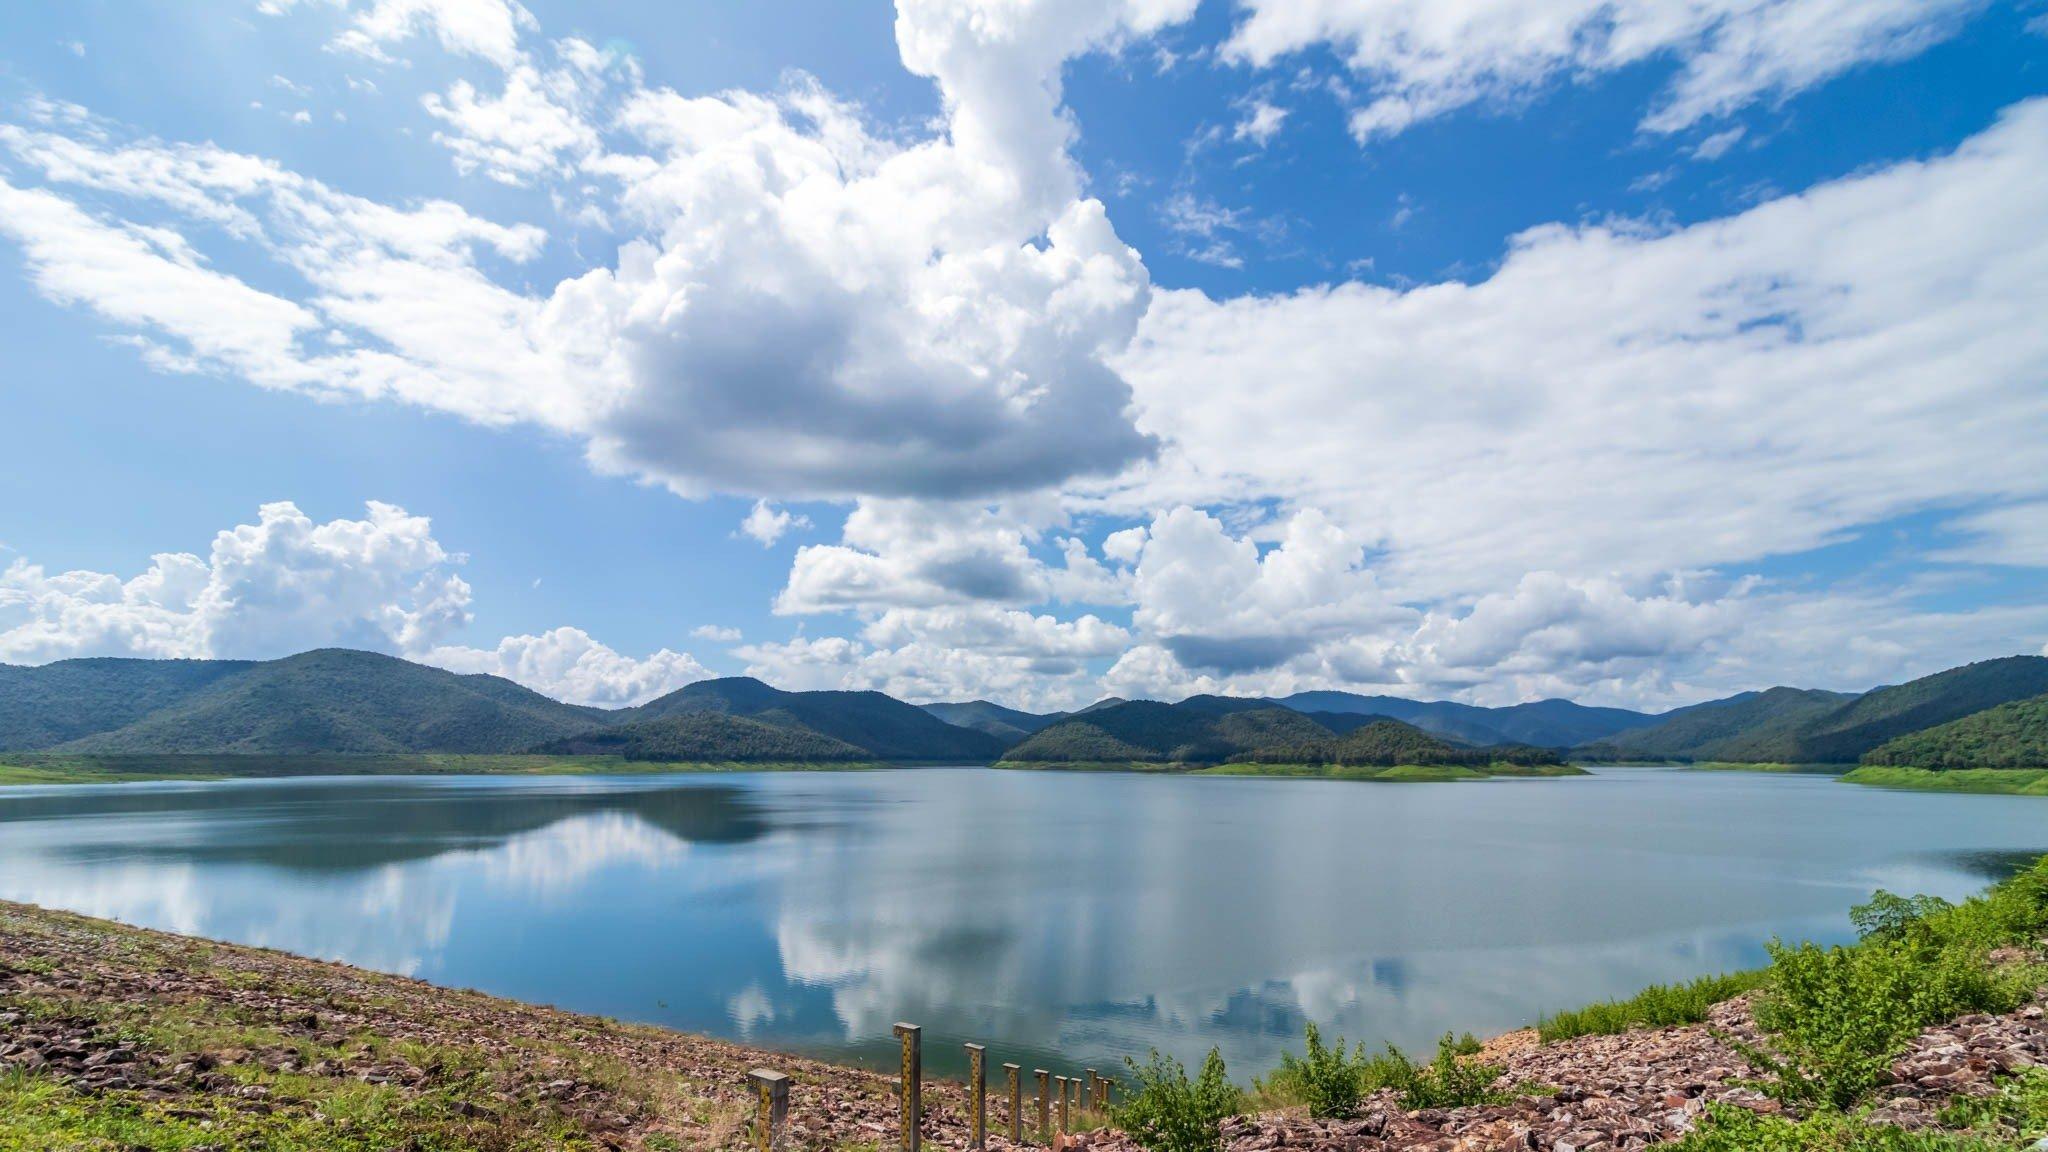 Mae Kuang Dam and Lookout Point - Luang Nuea, Doi Saket